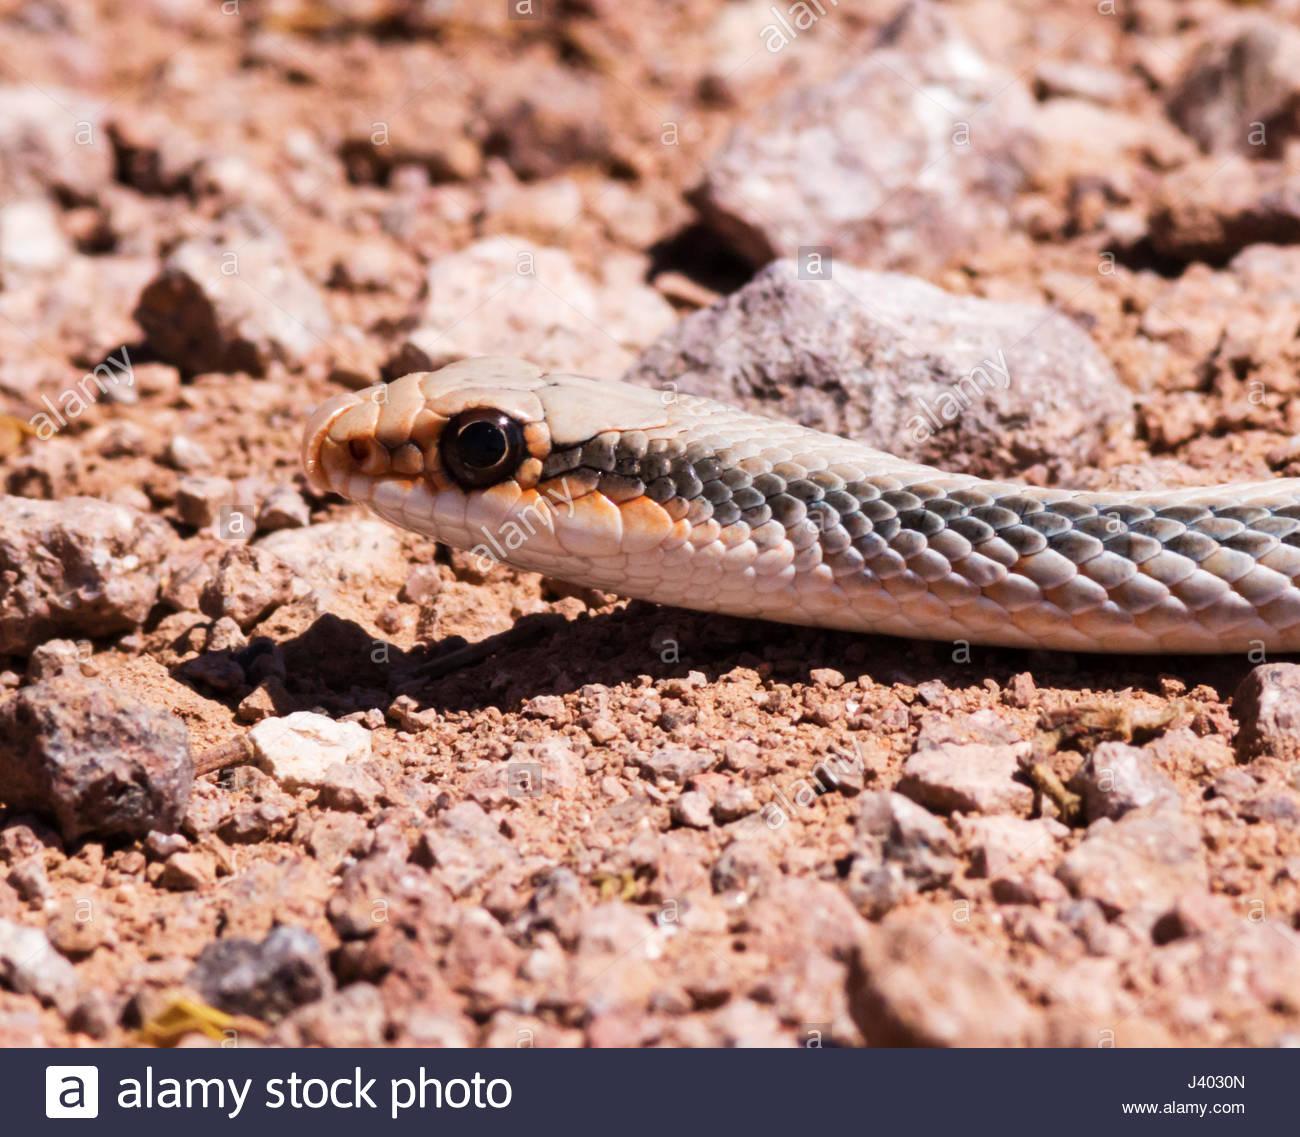 western-patch-nosed-snake-salvadora-hexa